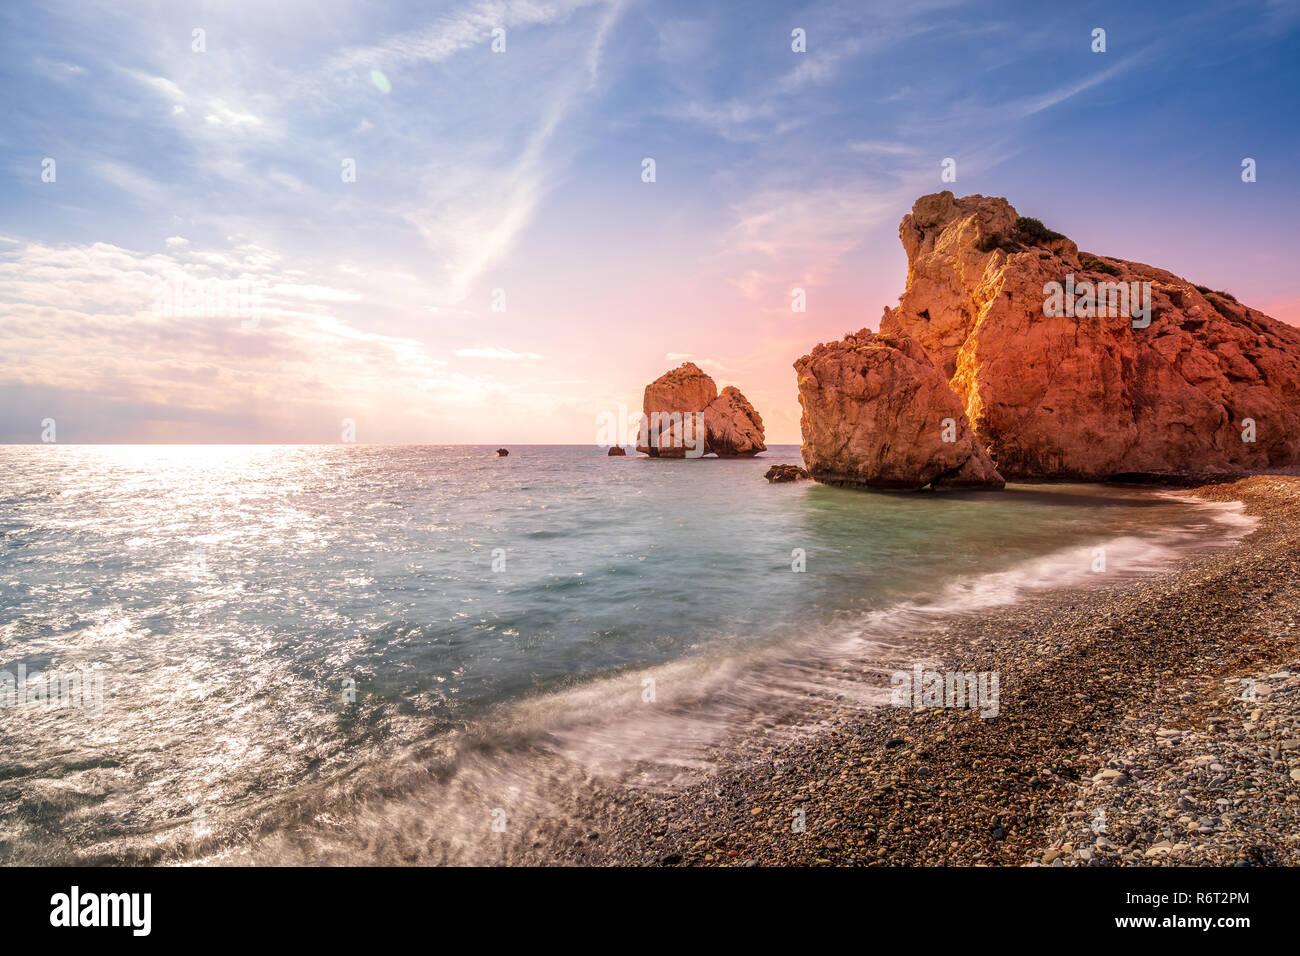 Longtime Exposure Aphrodite's Rock in Cyprus Greece - Stock Image